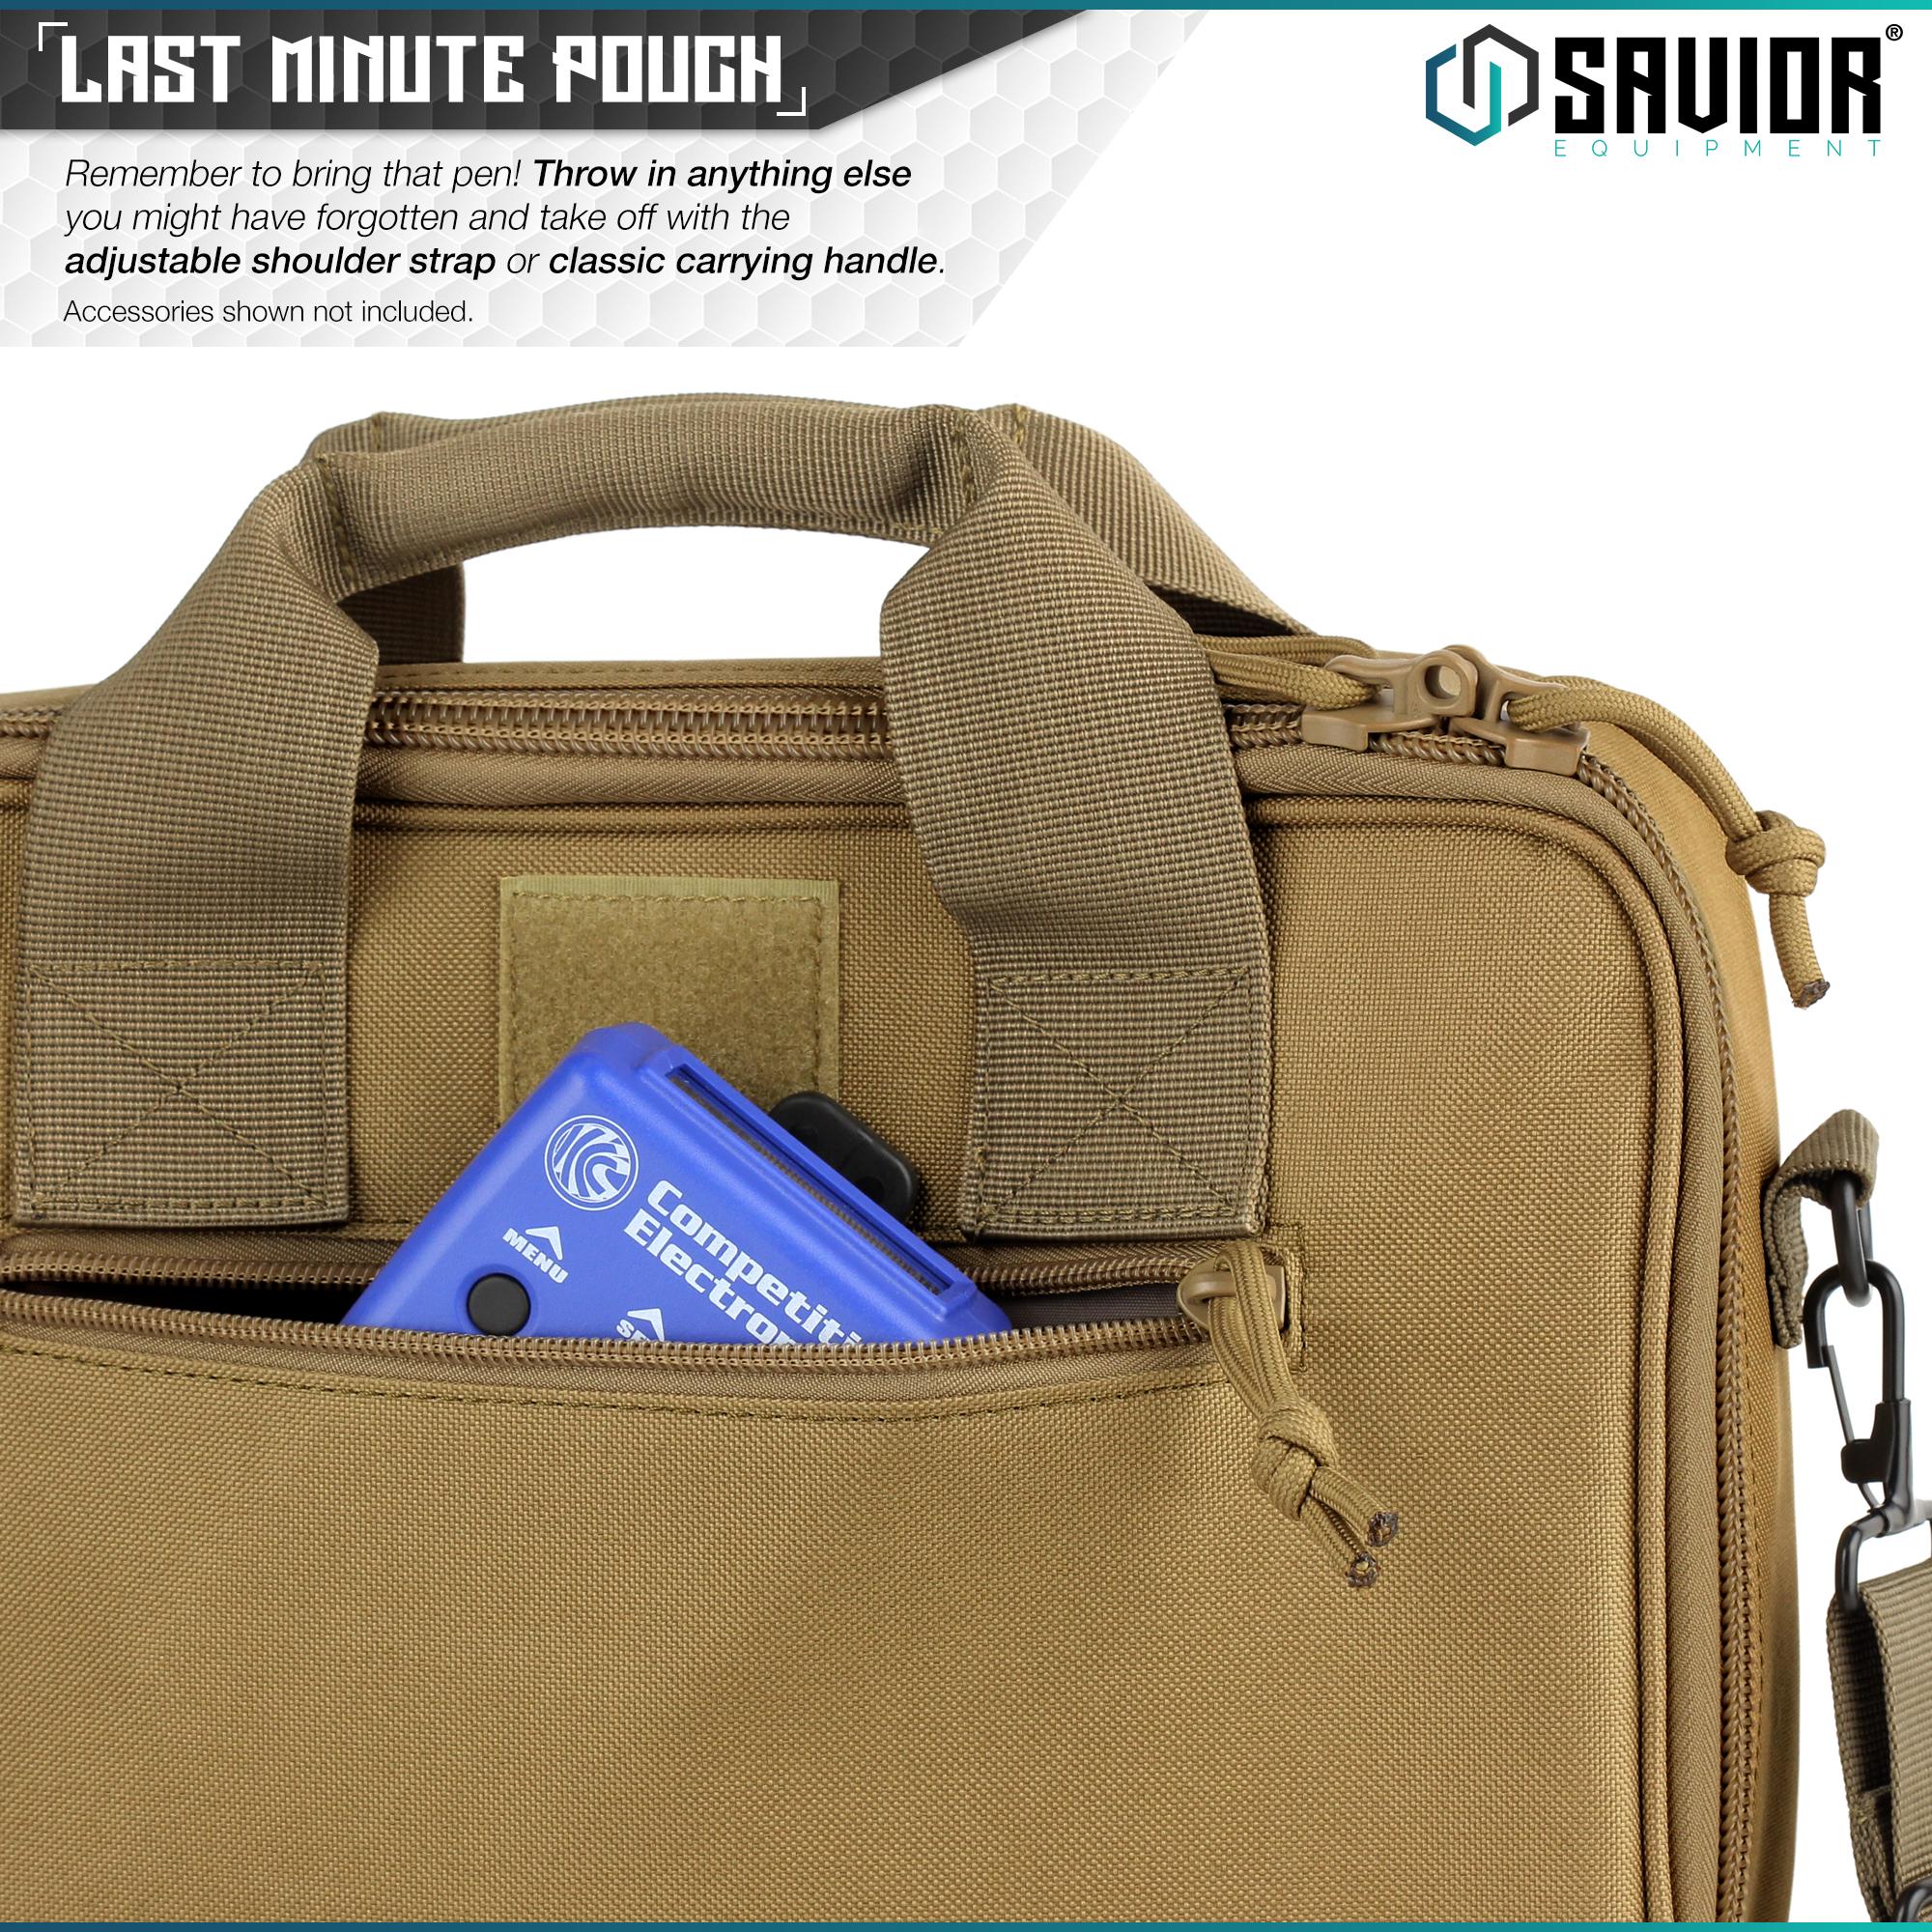 034-SAVIOR-034-Padded-Discreet-Double-Handgun-Bag-Pistol-Storage-Case-w-Mag-Pouch-Slot thumbnail 12